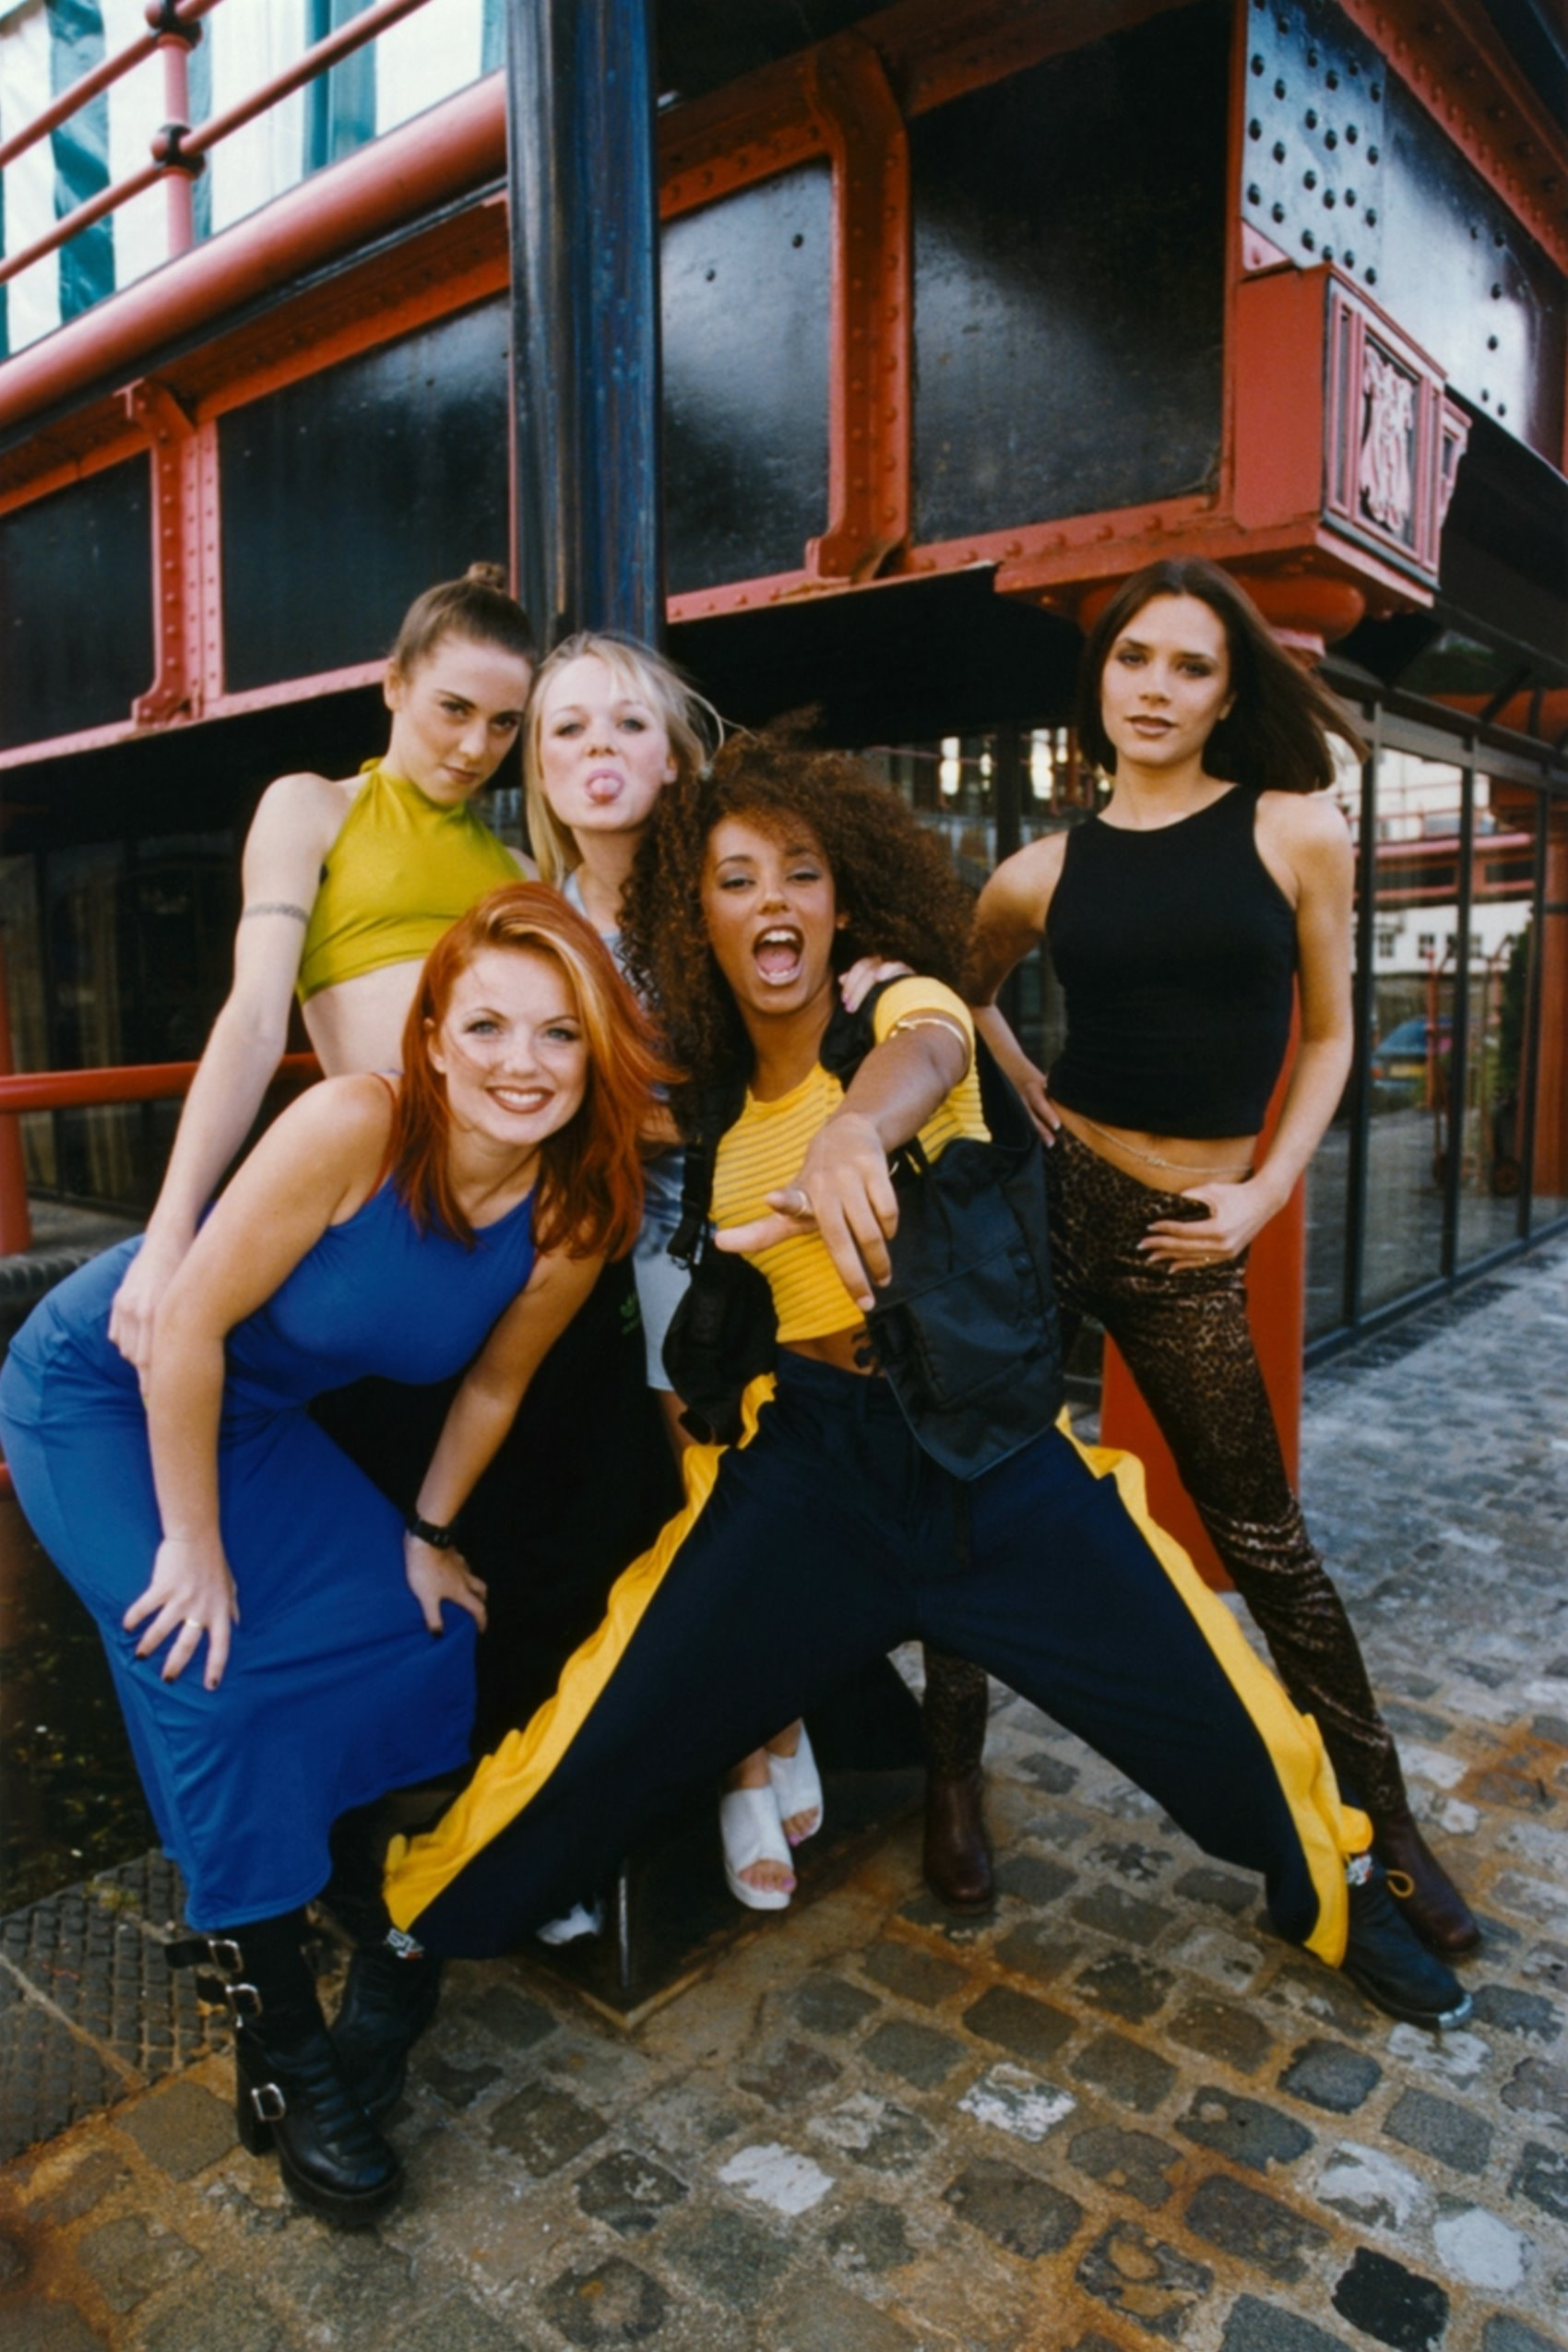 Spice Girls photo 74 of 144 pics, wallpaper - photo ...